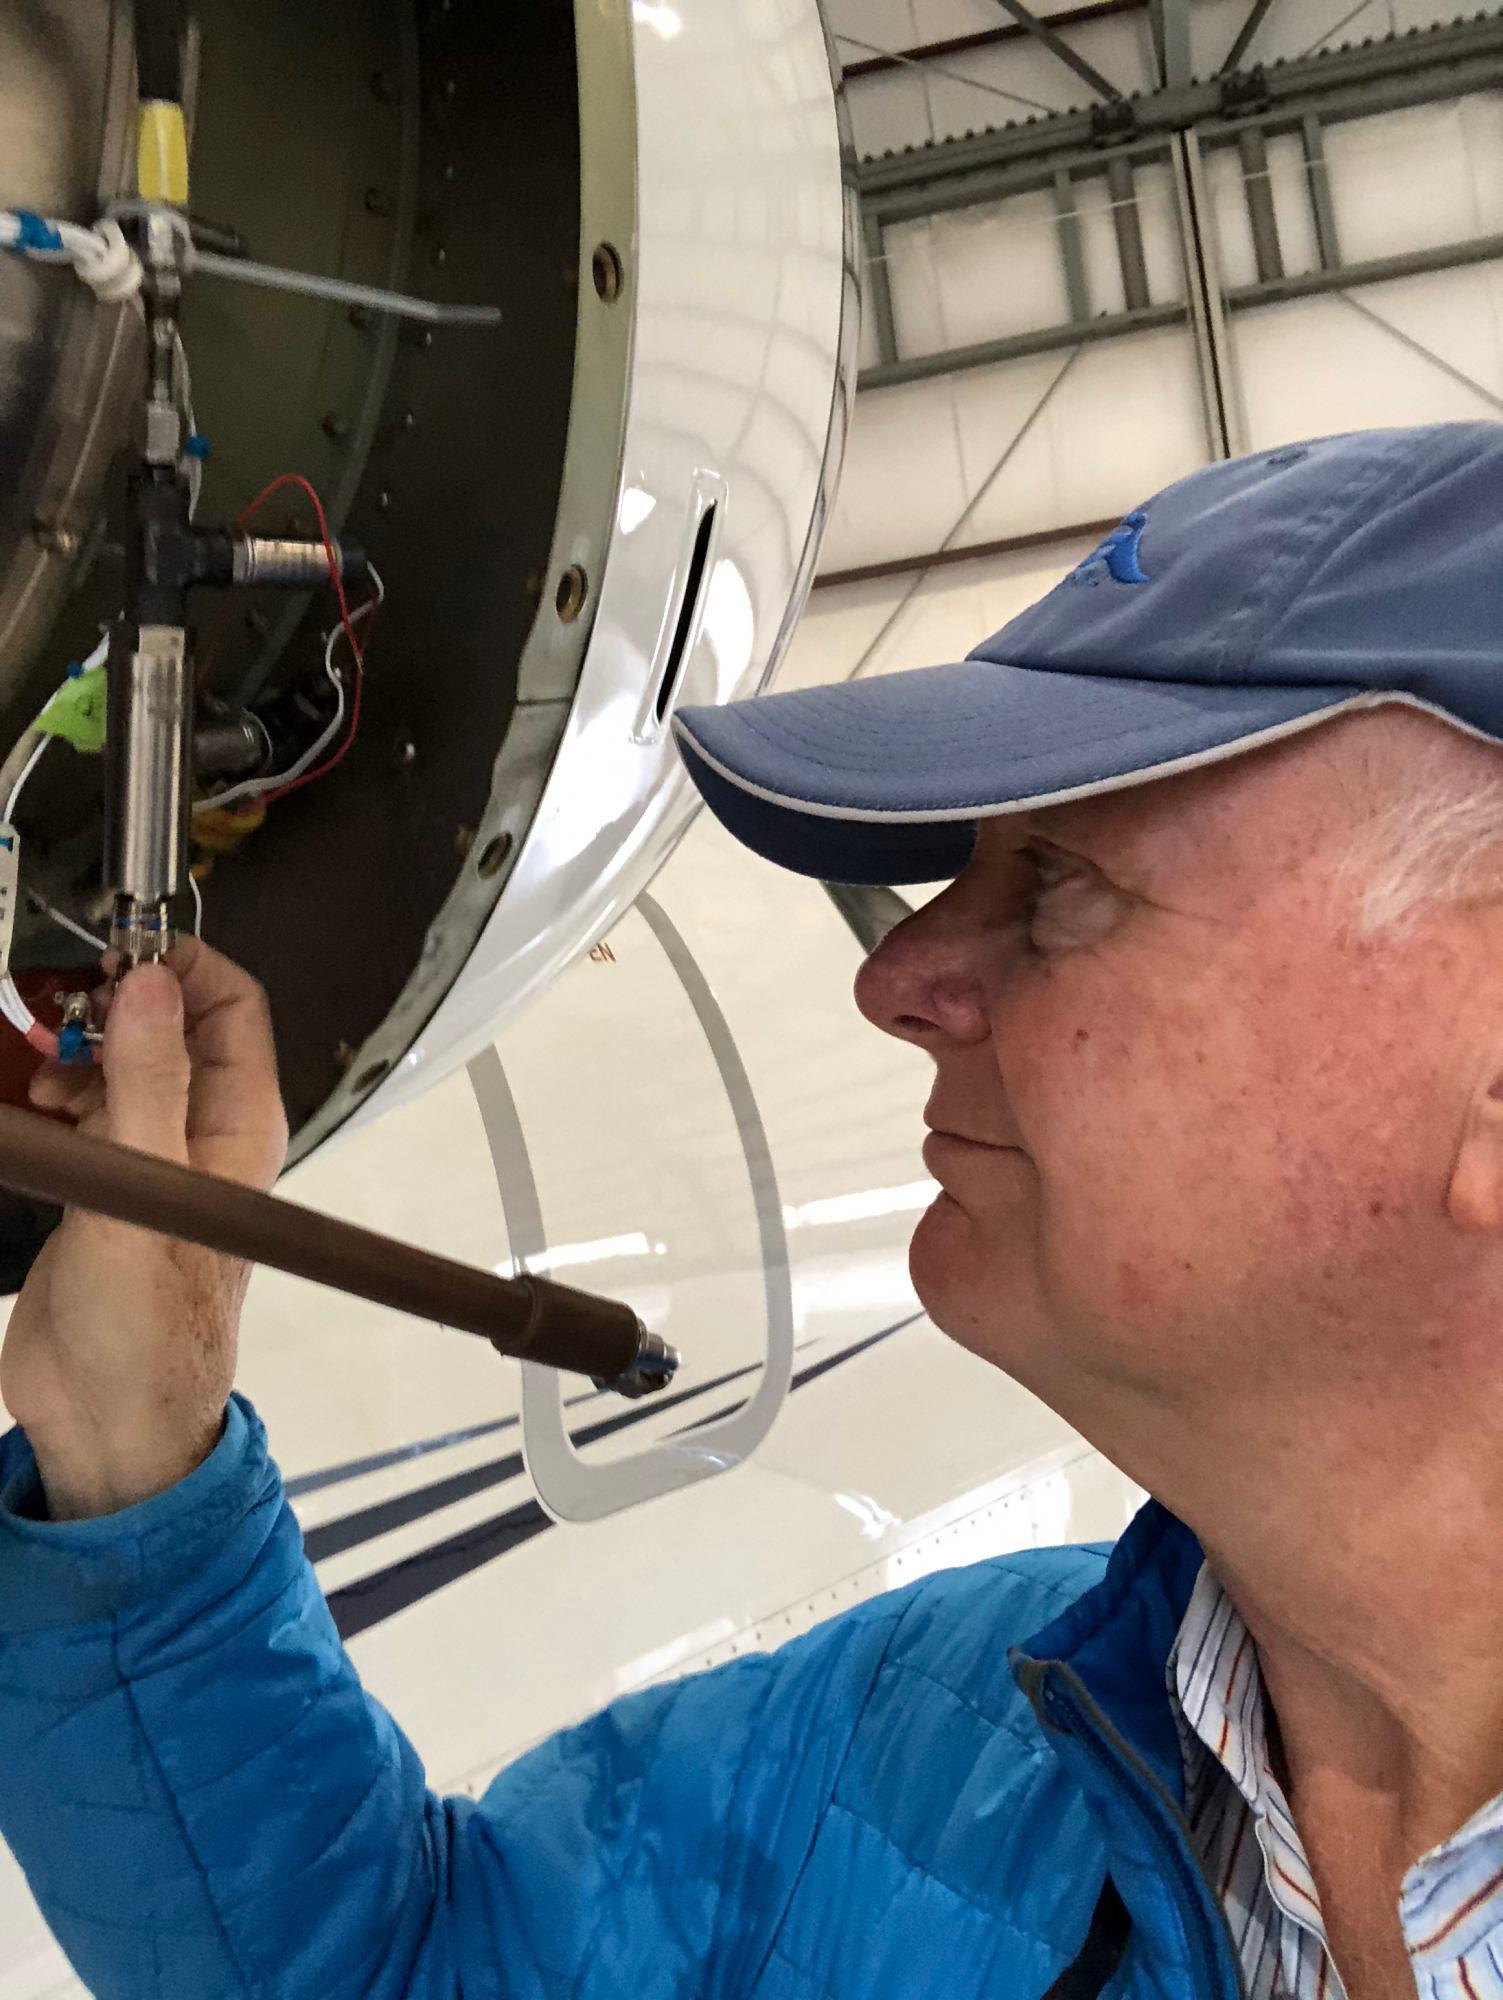 Our Citation CJ3 Trip to the Iditarod Race in Alaska Took an